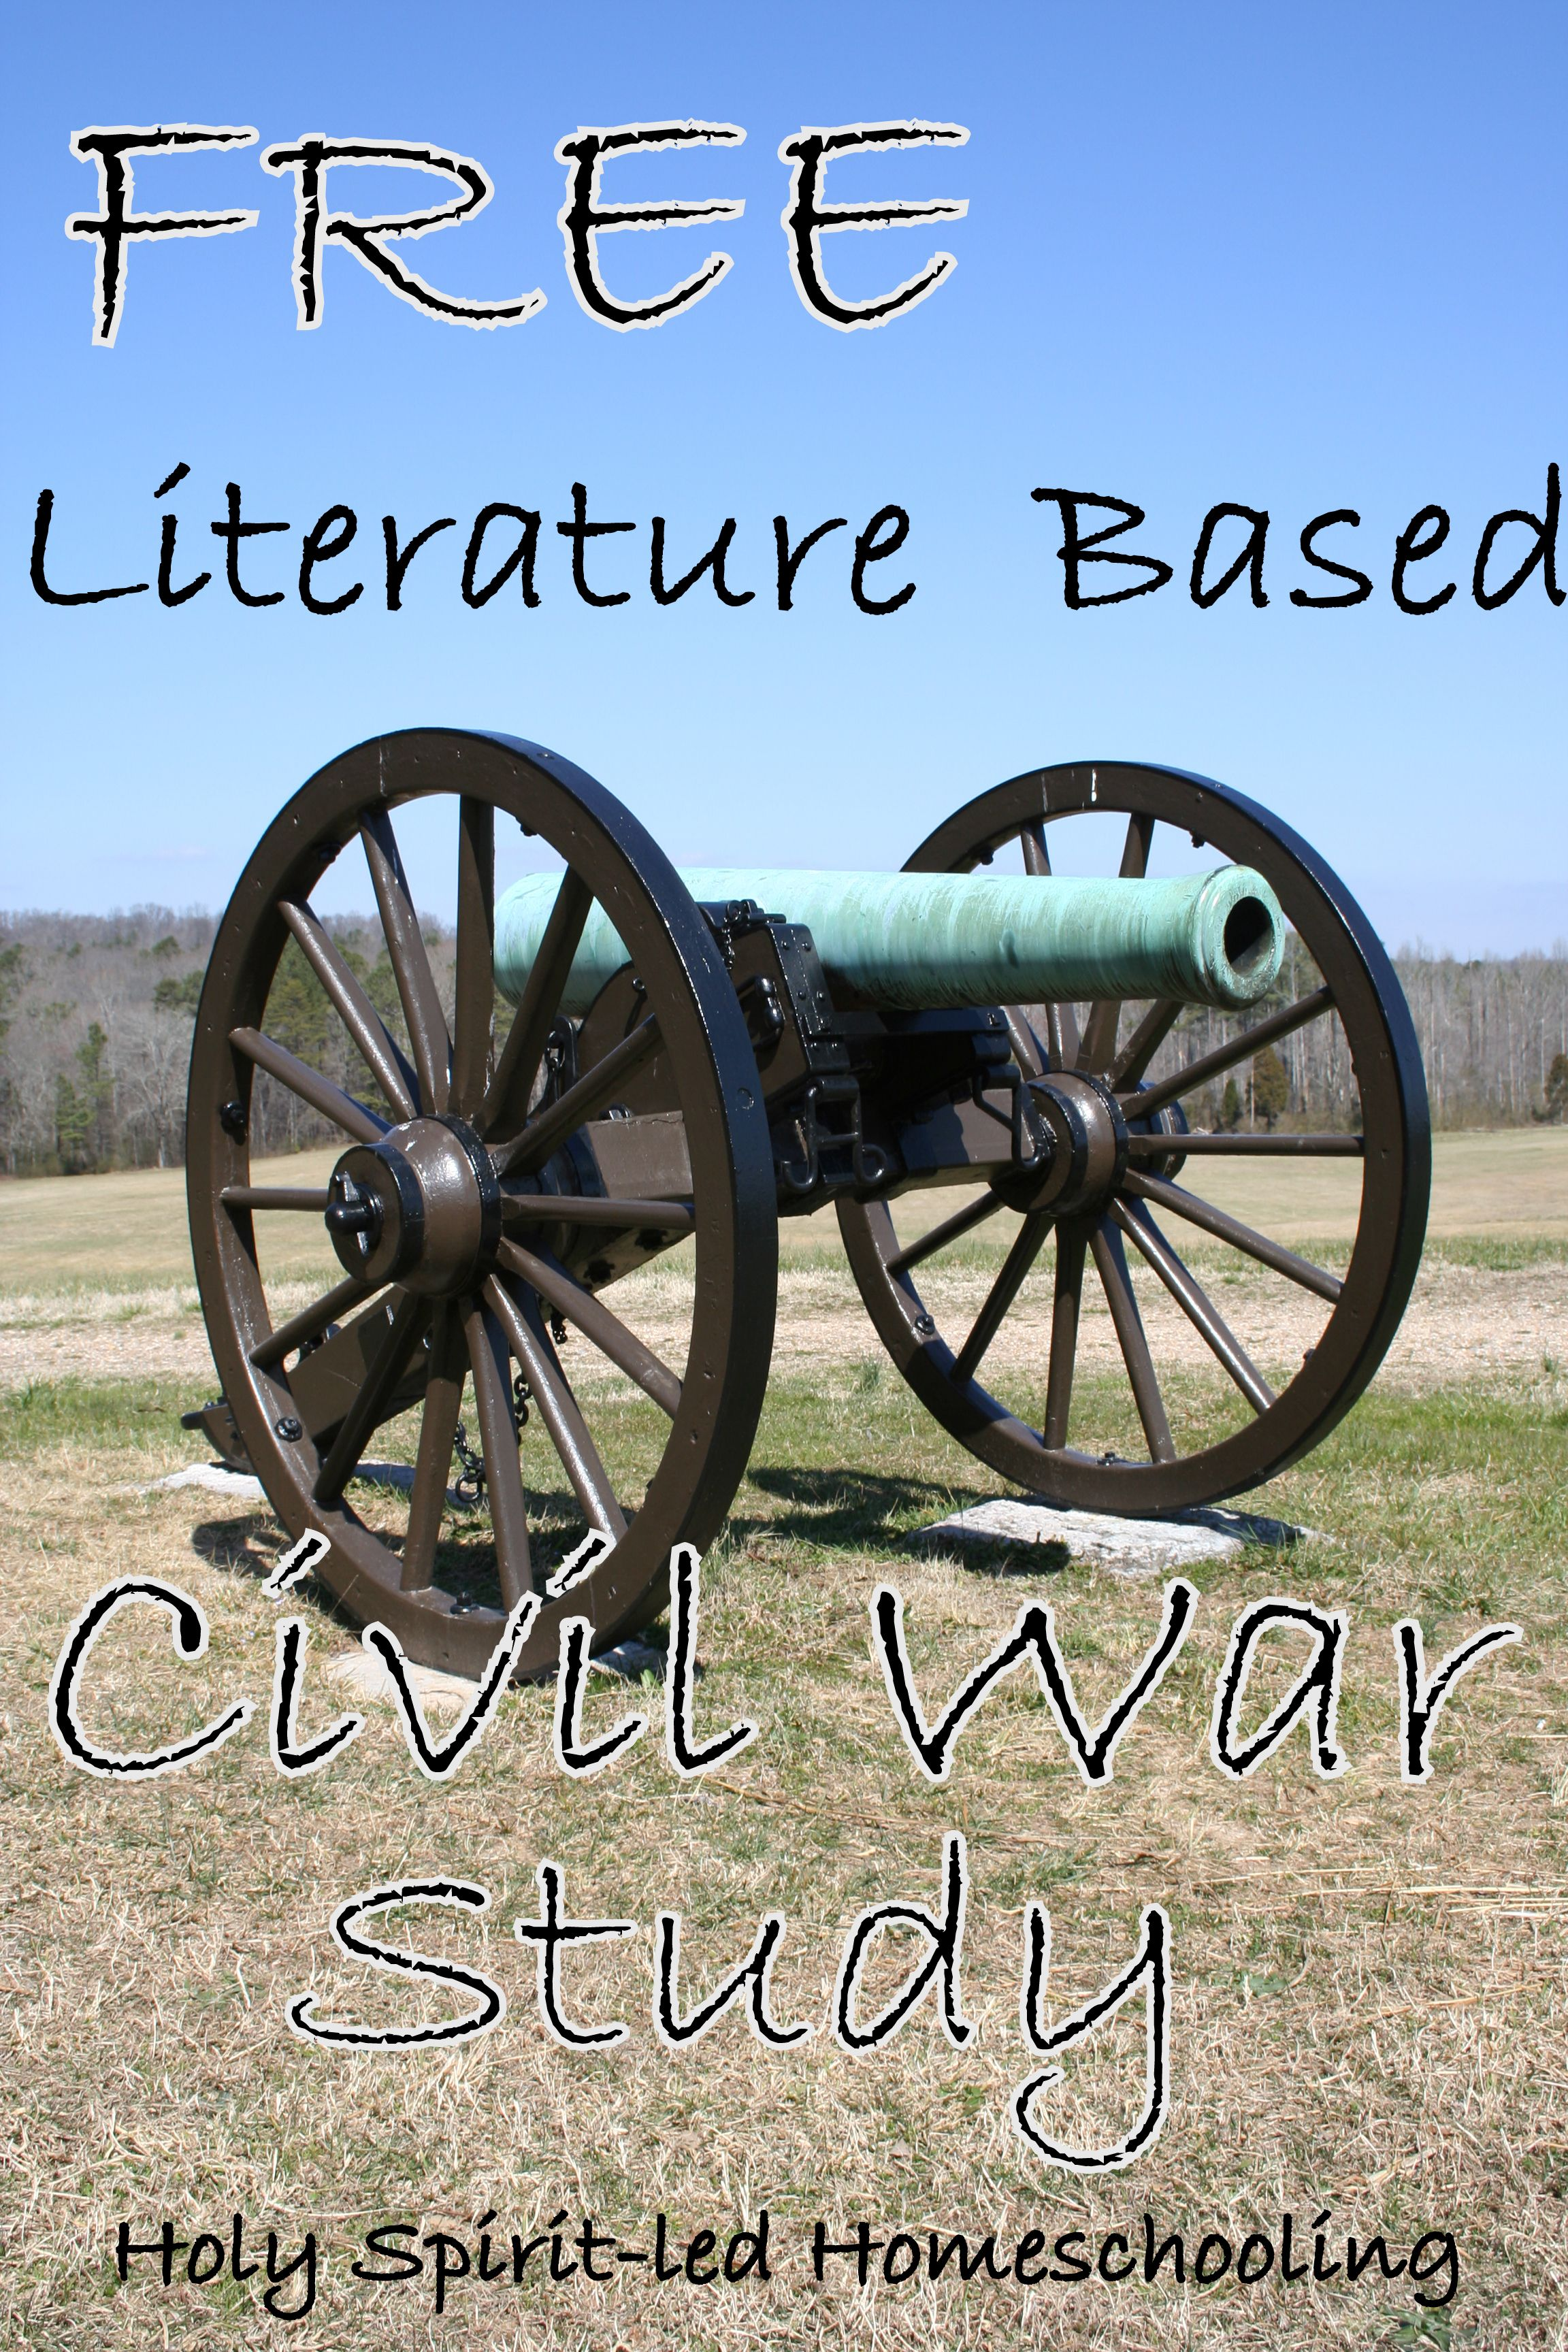 07 25 12 Free Literature Based Curriculum On The Civil War